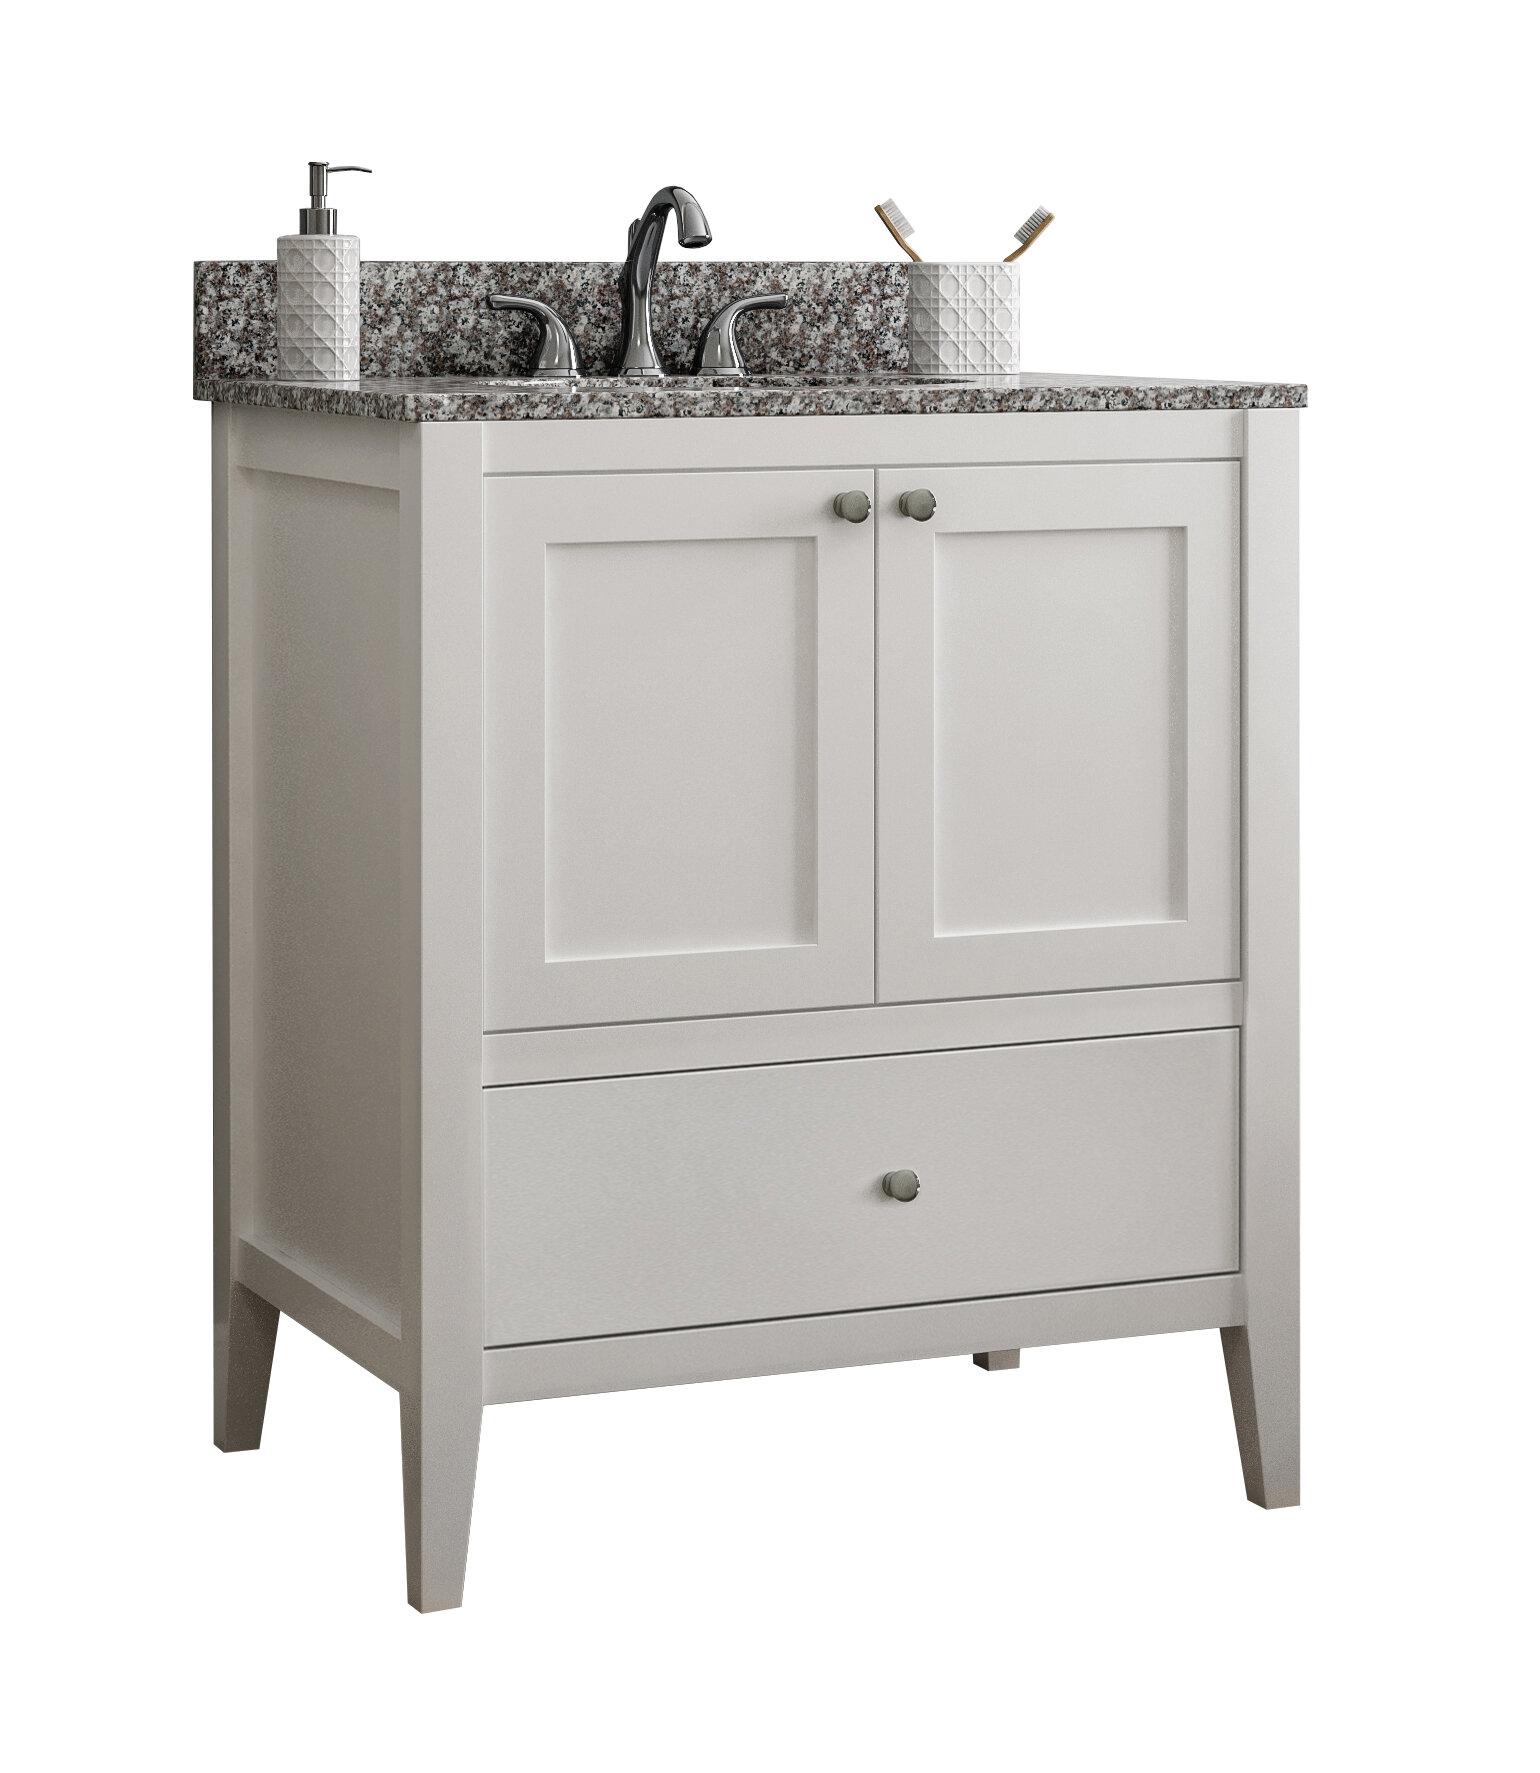 Cnc Cabinetry Vanguard 24 Single Bathroom Vanity Base Only